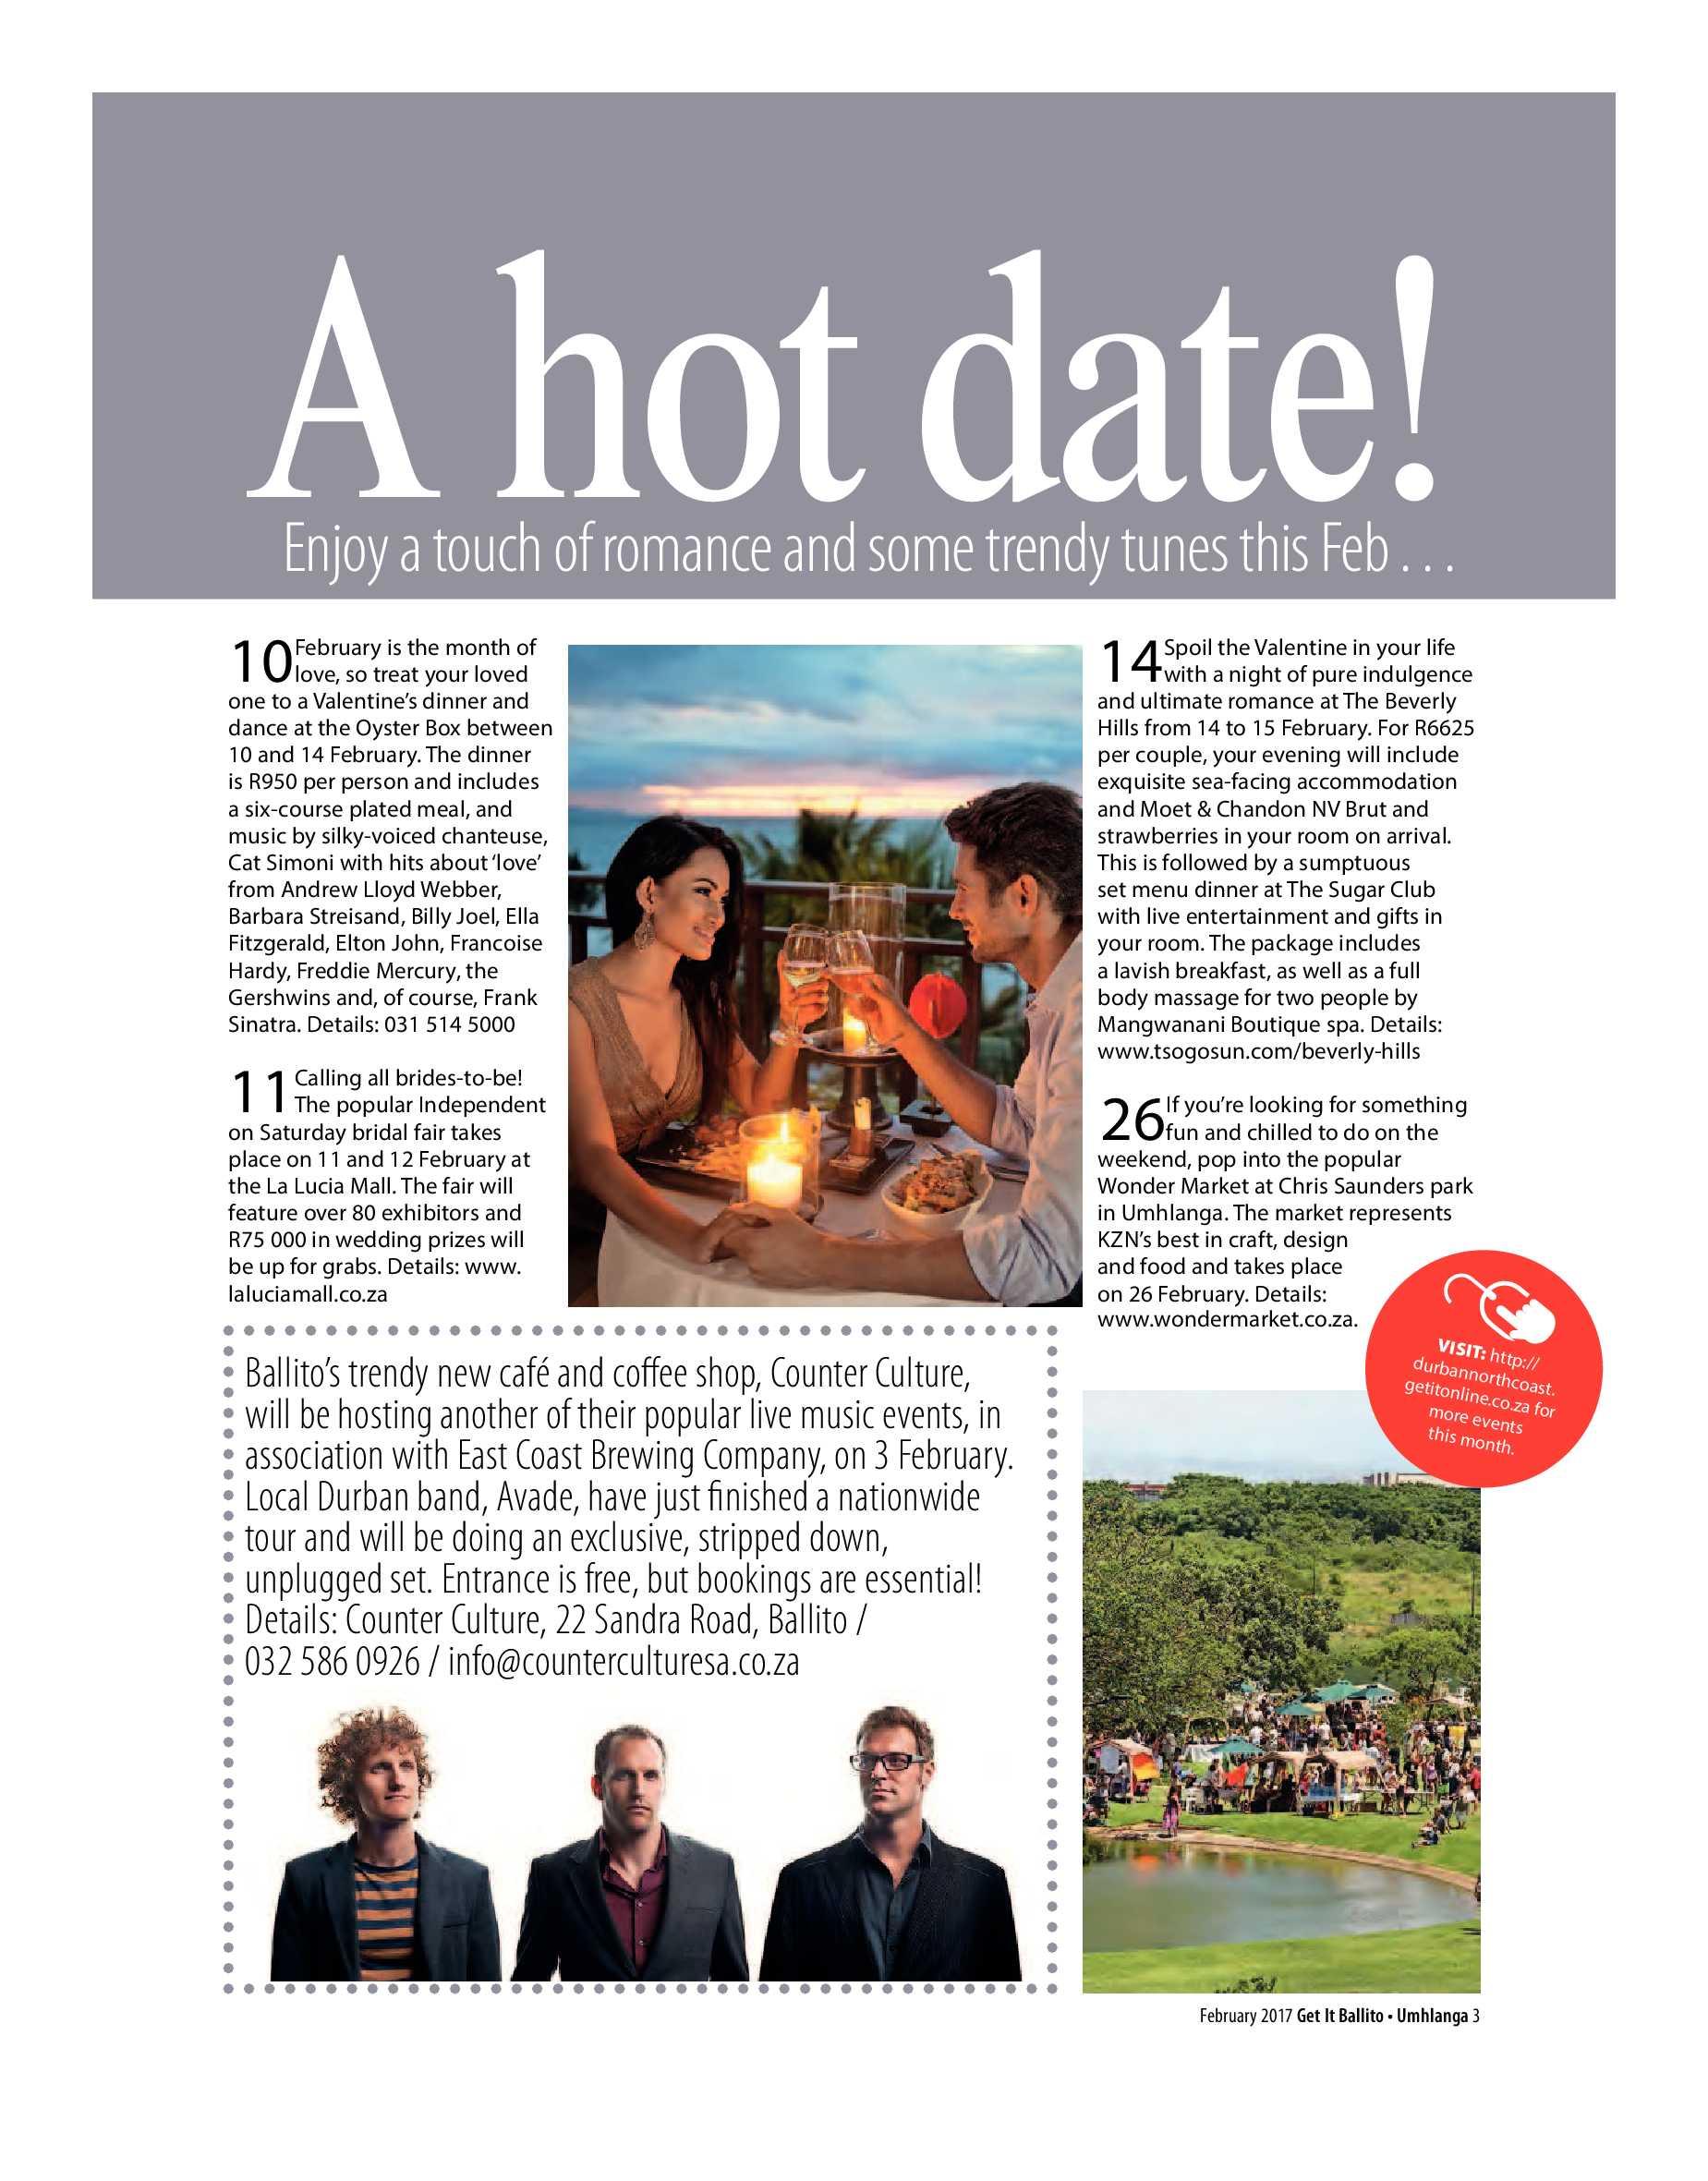 get-it-magazine-ballitoumhlanga-february-2017-epapers-page-5